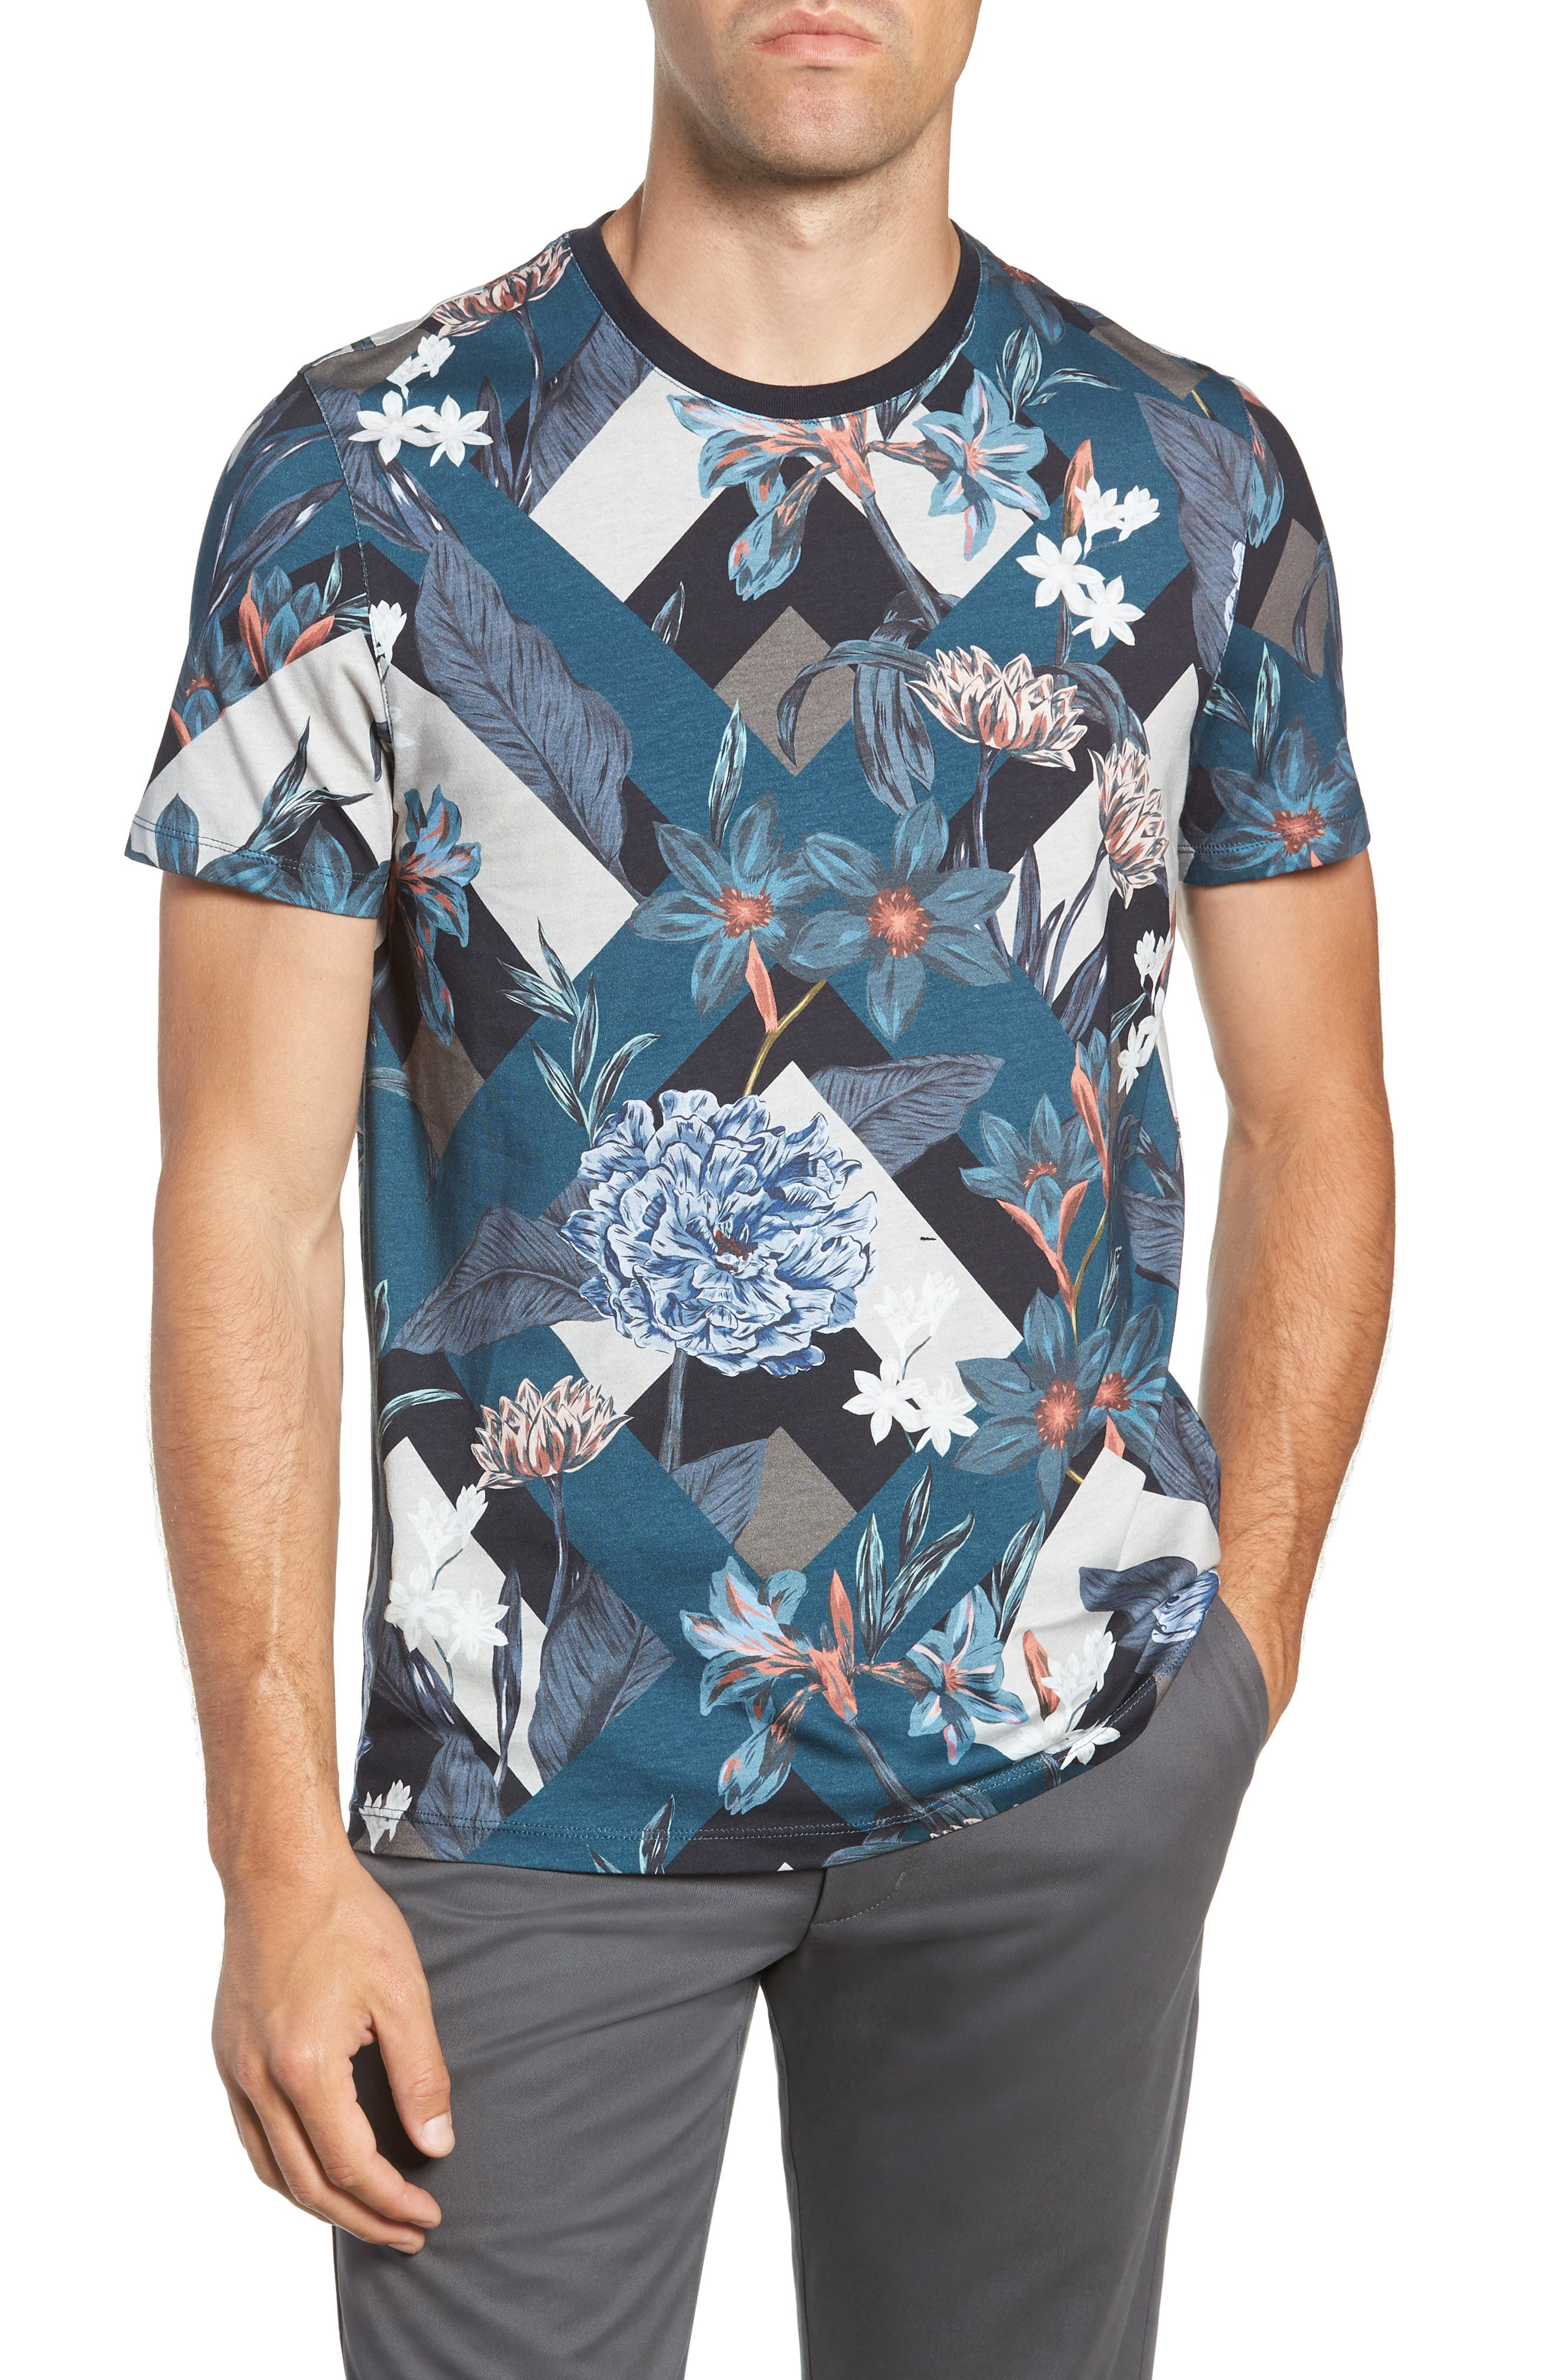 Jolly Slim Fit T-Shirt,                         Main,                         color, 410